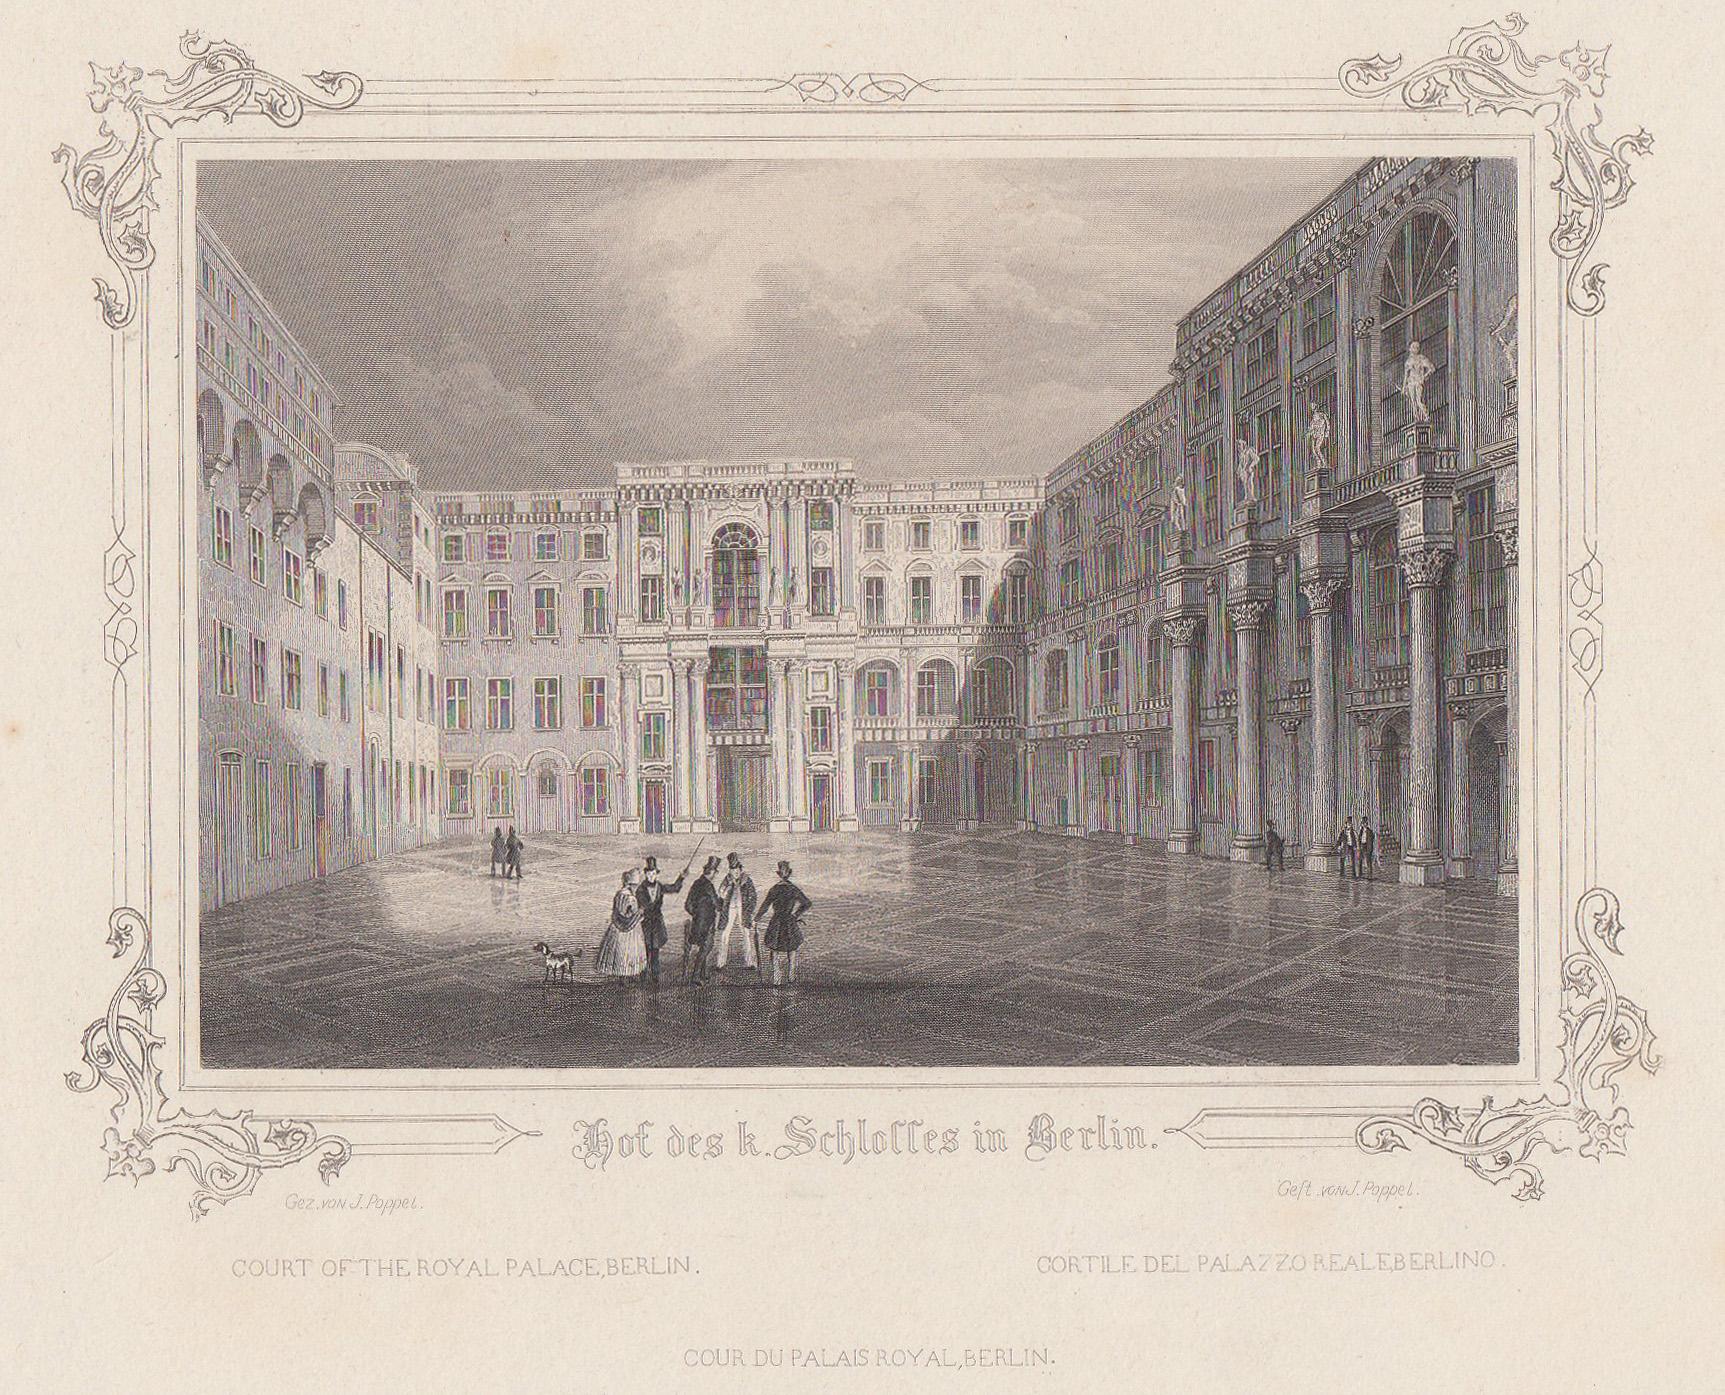 "Schloßhof, ""Hof des k. Schlosses in Berlin"".: Berlin - Schloss:"